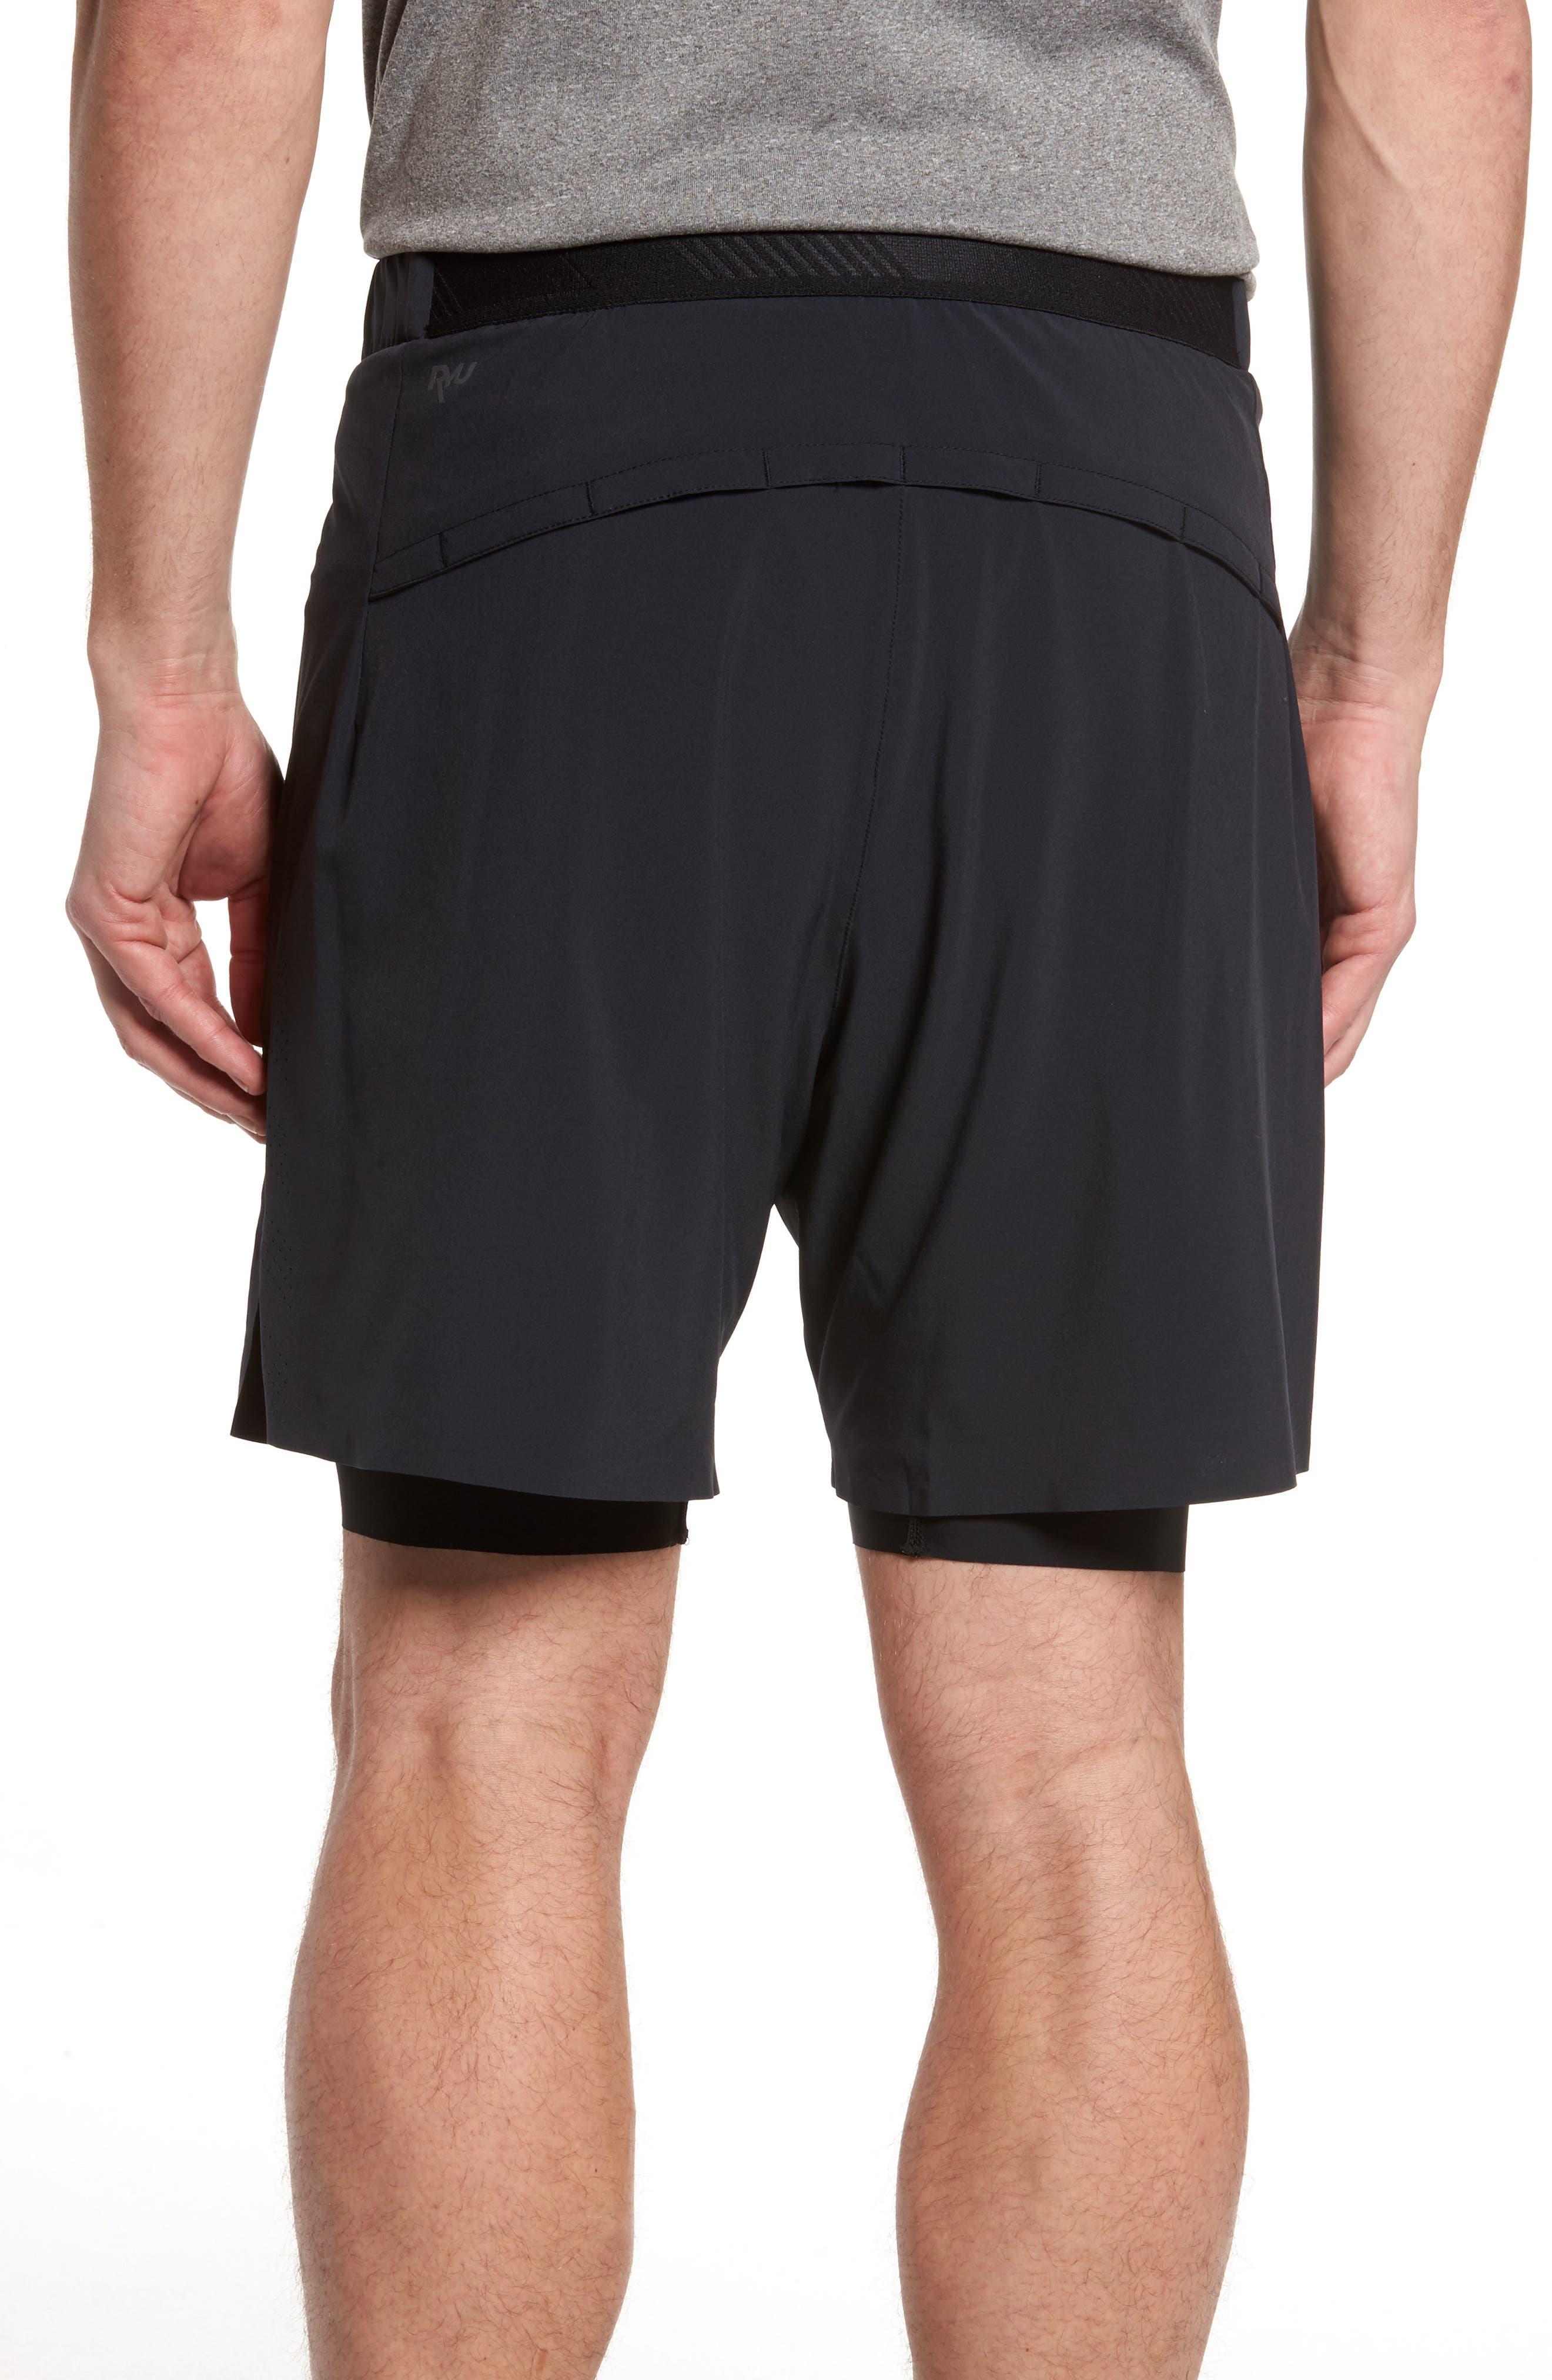 Interval 2-in-1 Shorts,                             Alternate thumbnail 2, color,                             Black